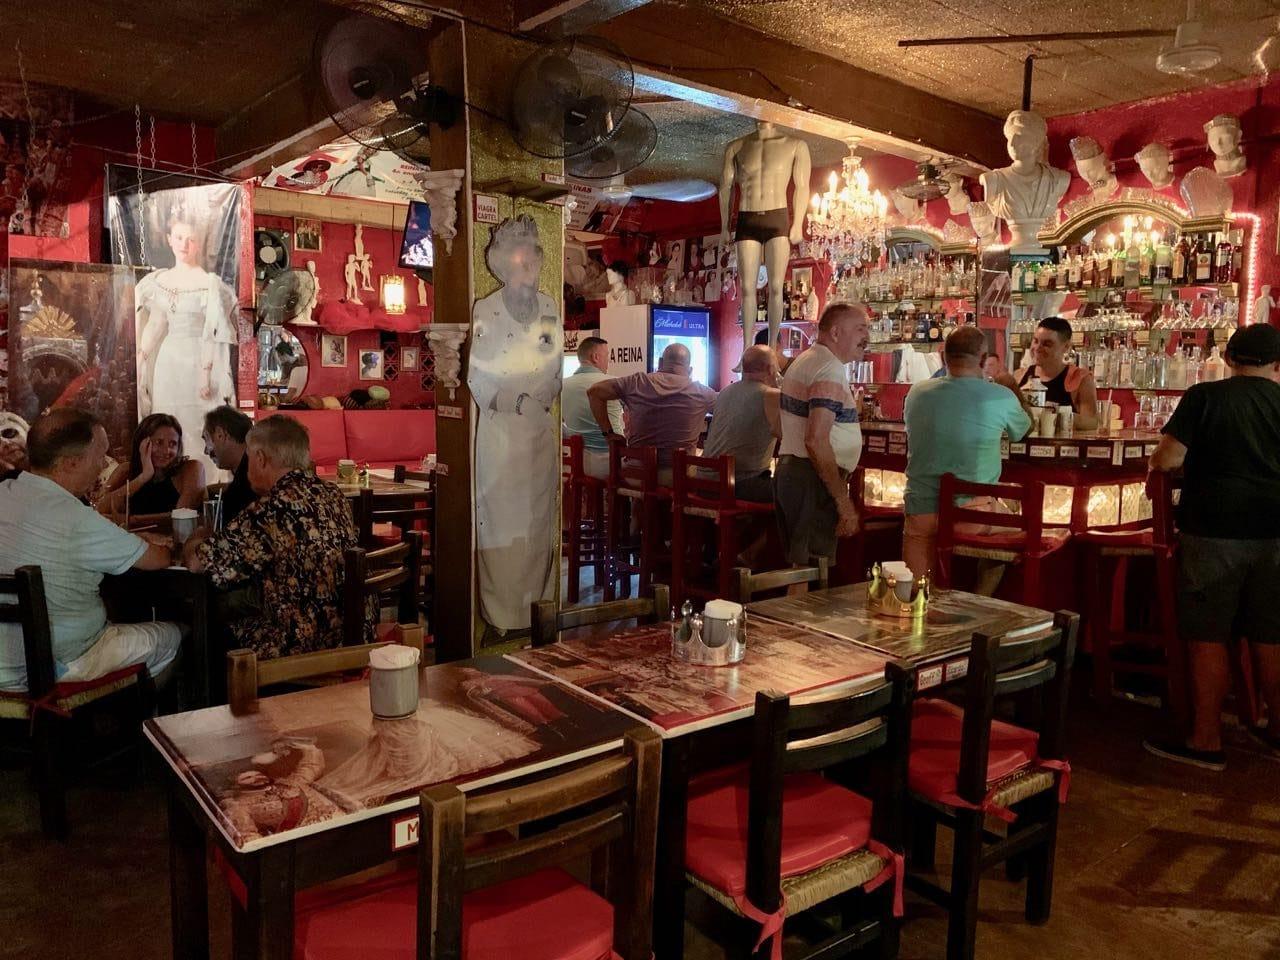 Bar Reinas is a must-visit for queer Queen Elizabeth fans.